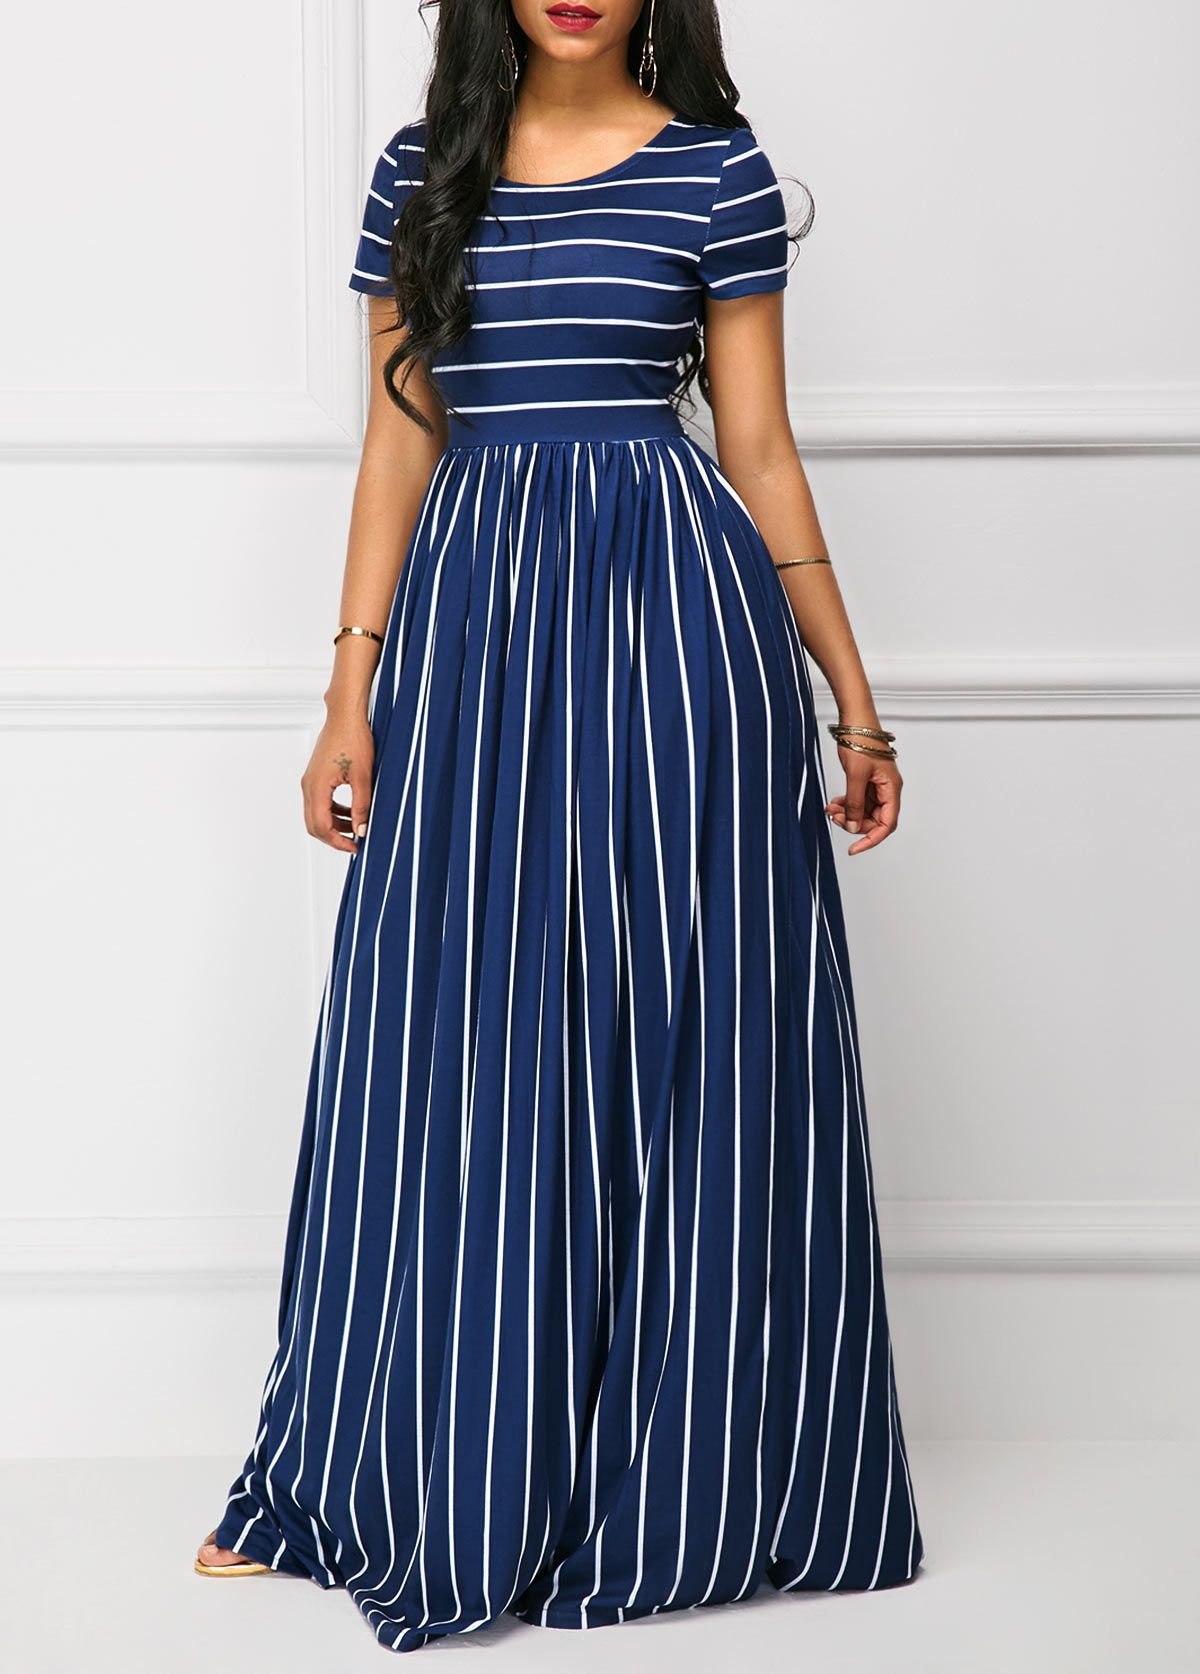 High Waist Stripe Print Short Sleeve Navy Maxi Dress Rotita Com Usd 33 39 Maxi Dress Short Sleeve Maxi Dresses Maxi Dress With Sleeves [ 1674 x 1200 Pixel ]